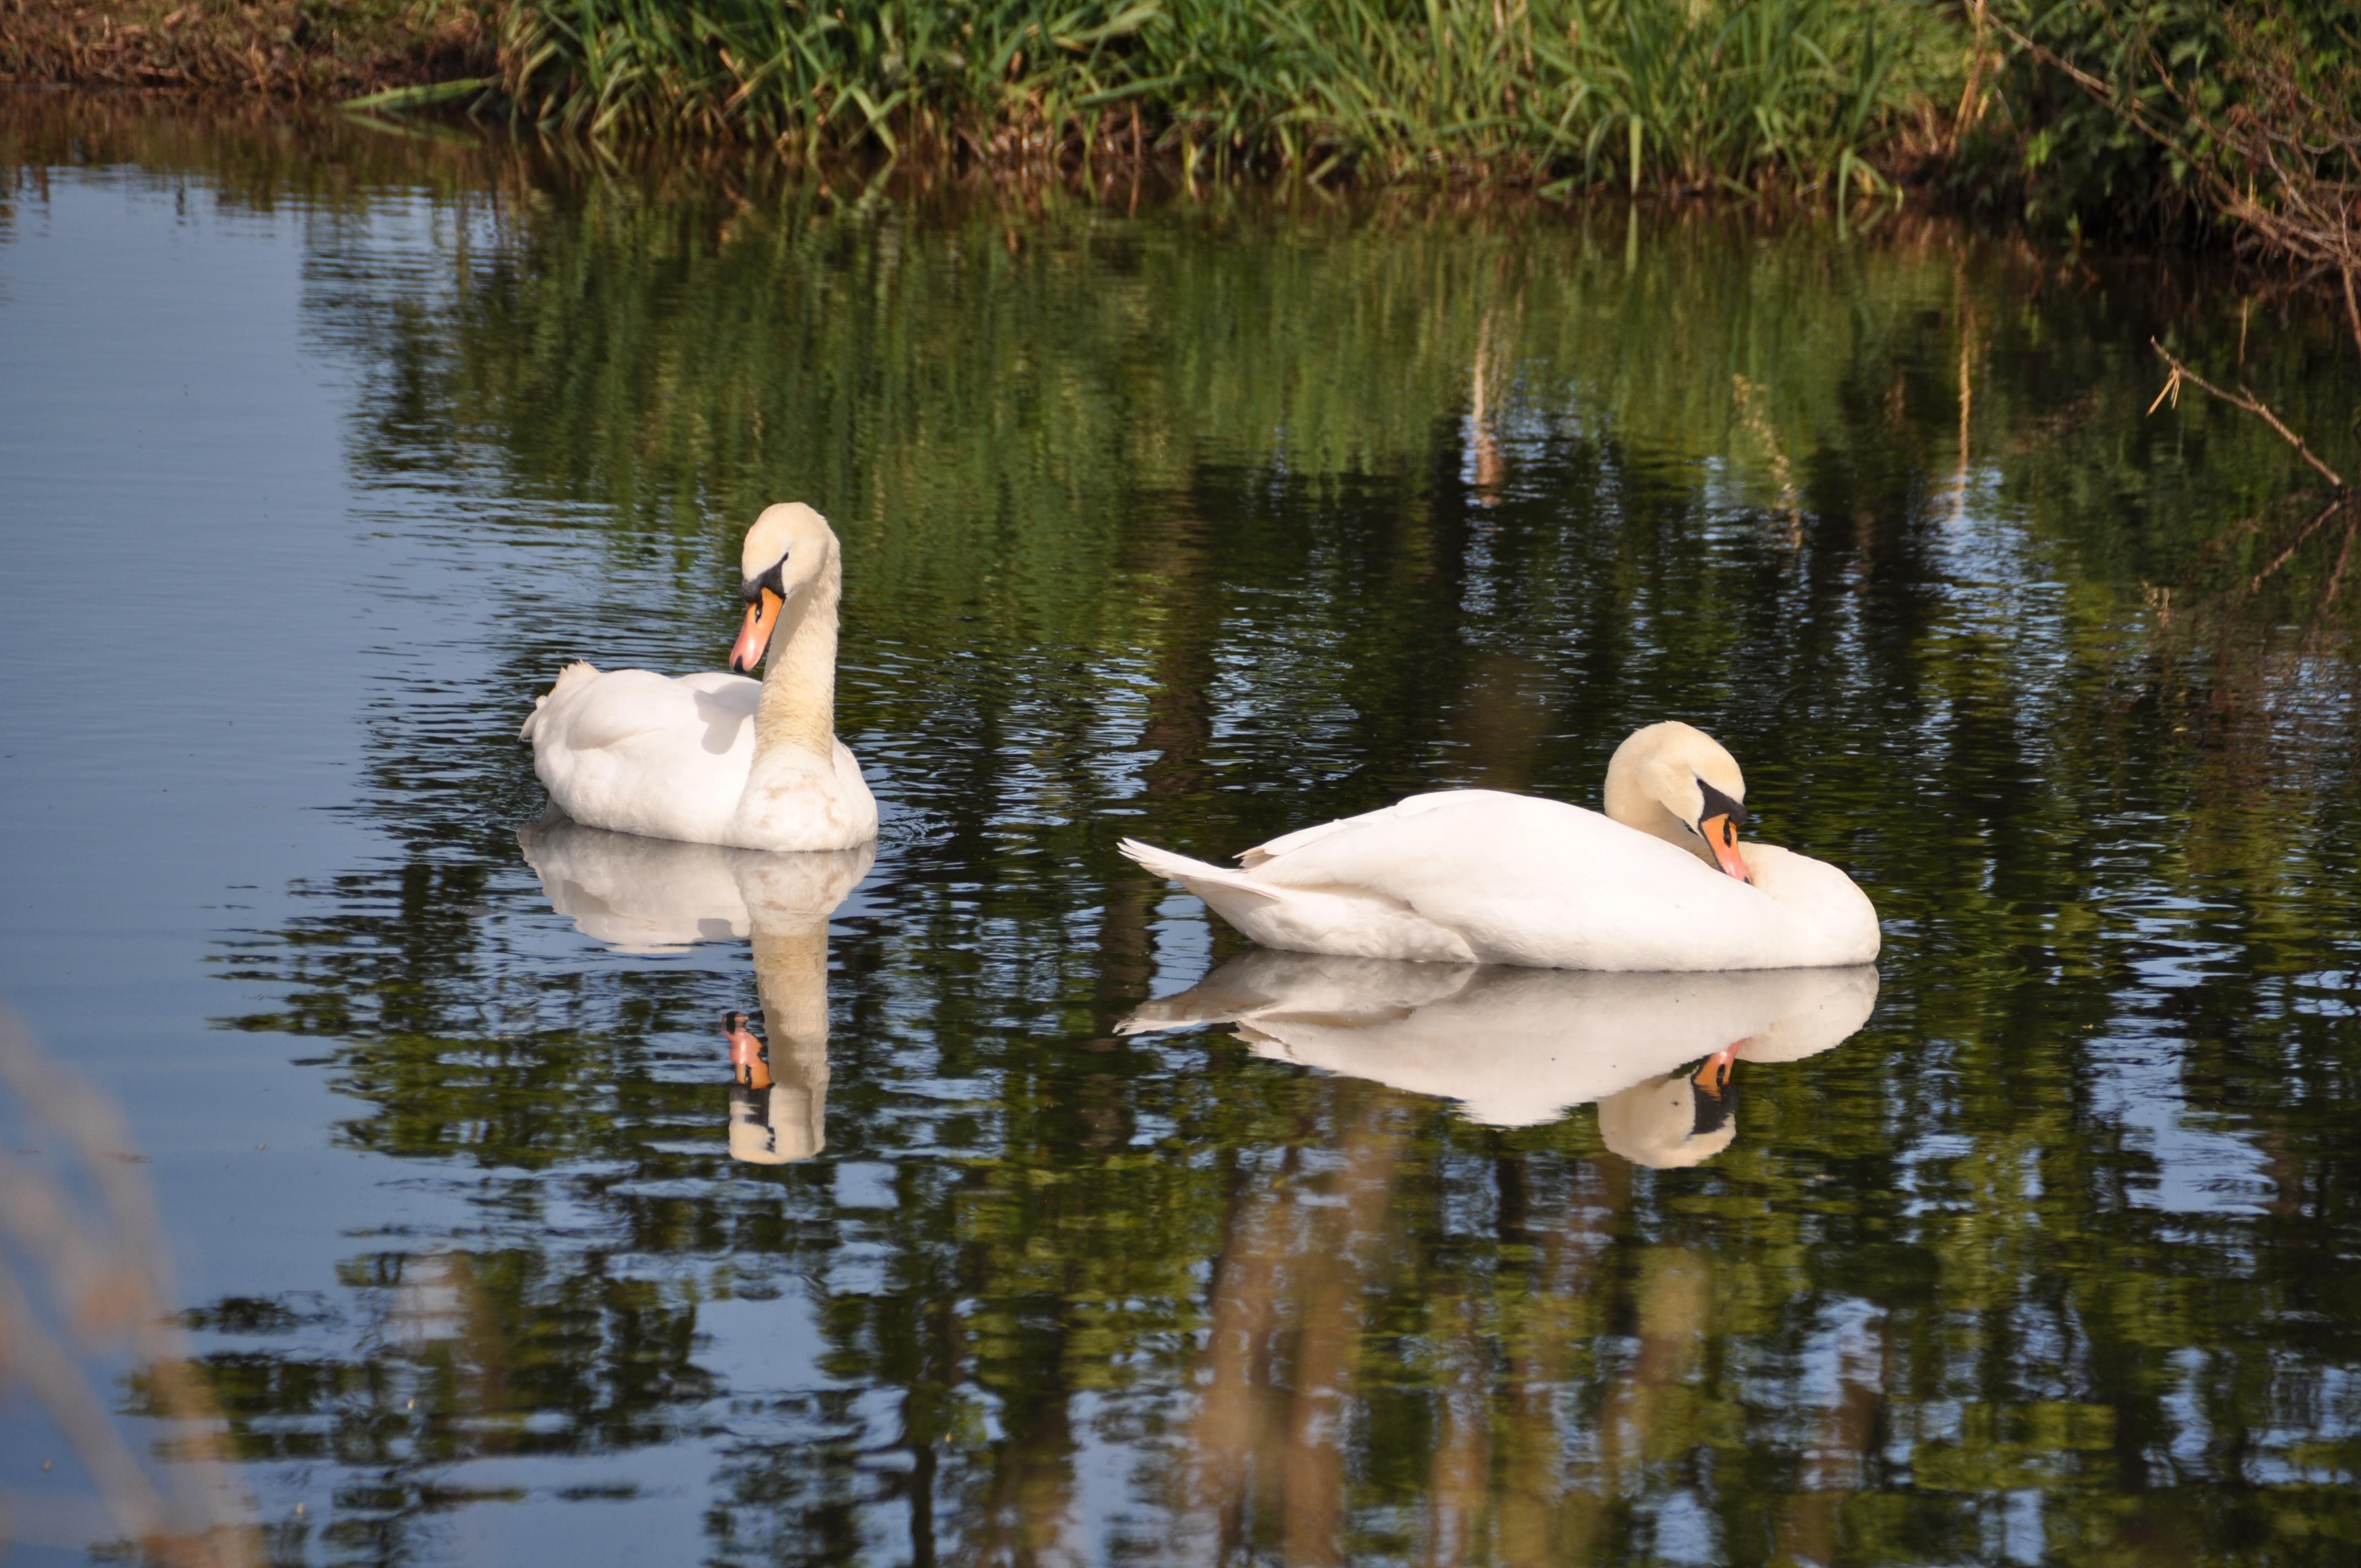 Swans on the River Tyne, East Linton, East Lothian.